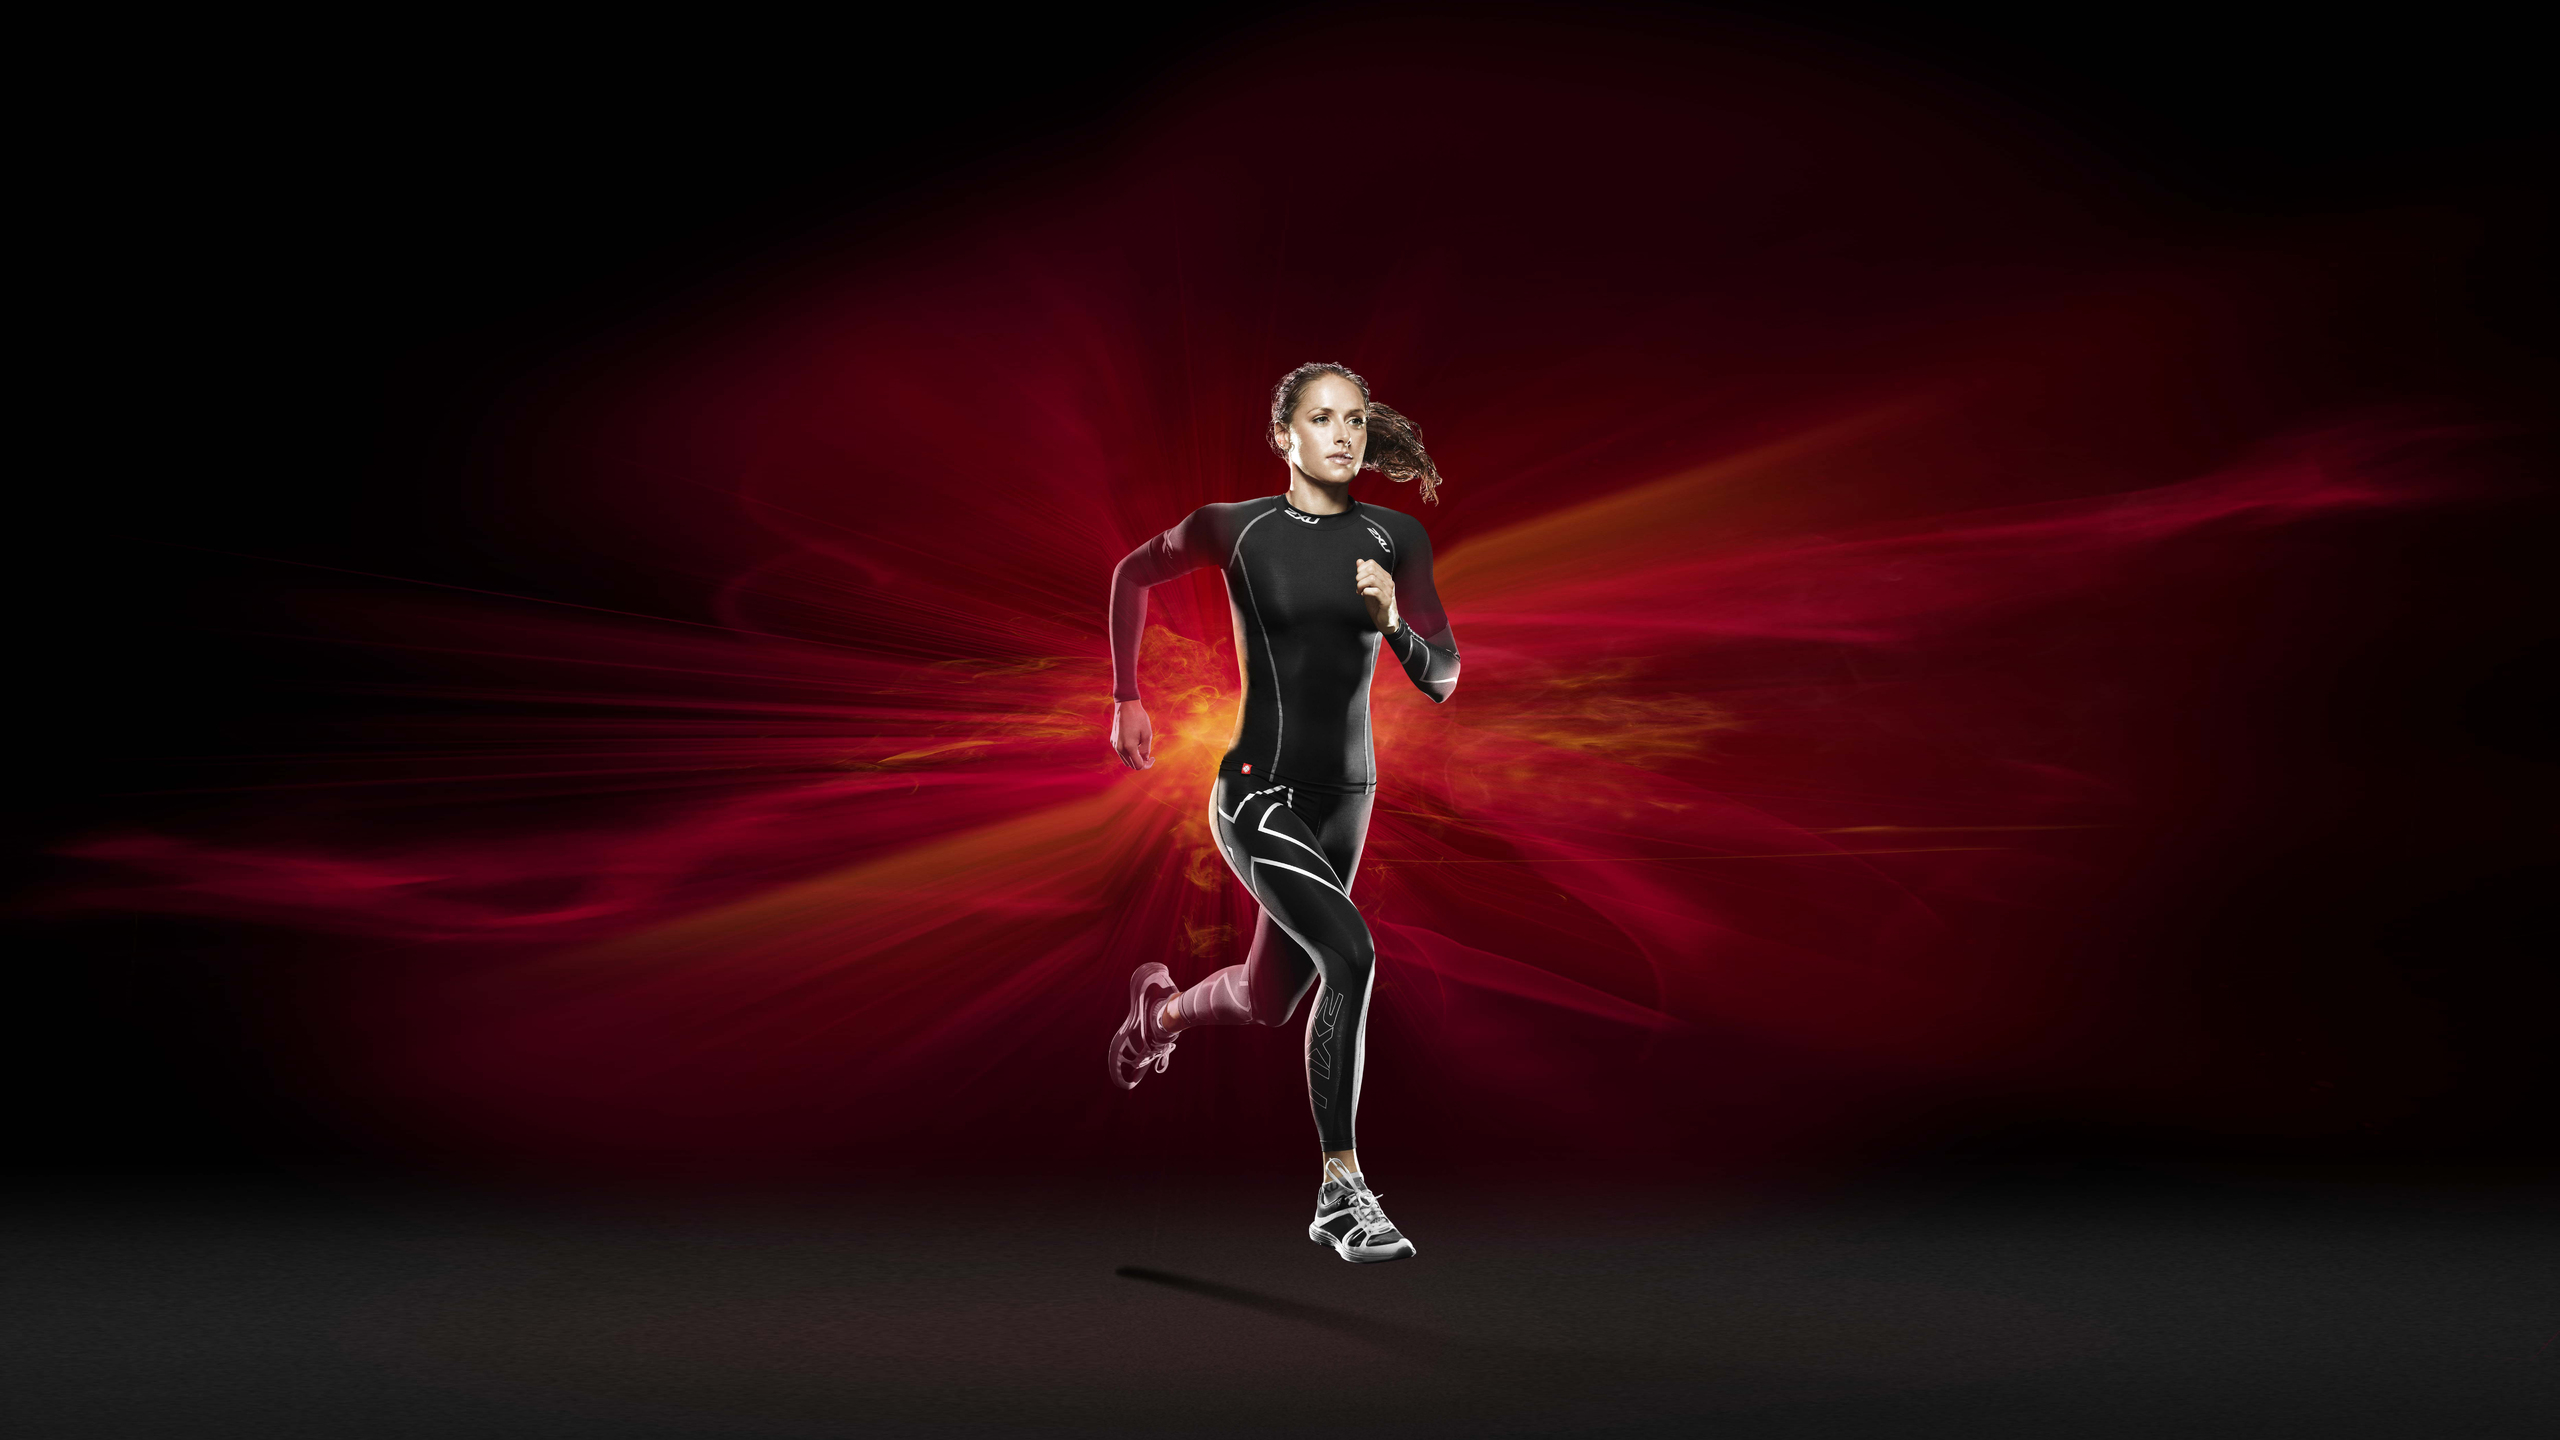 running girl wallpaper background 53832 2560x1440px